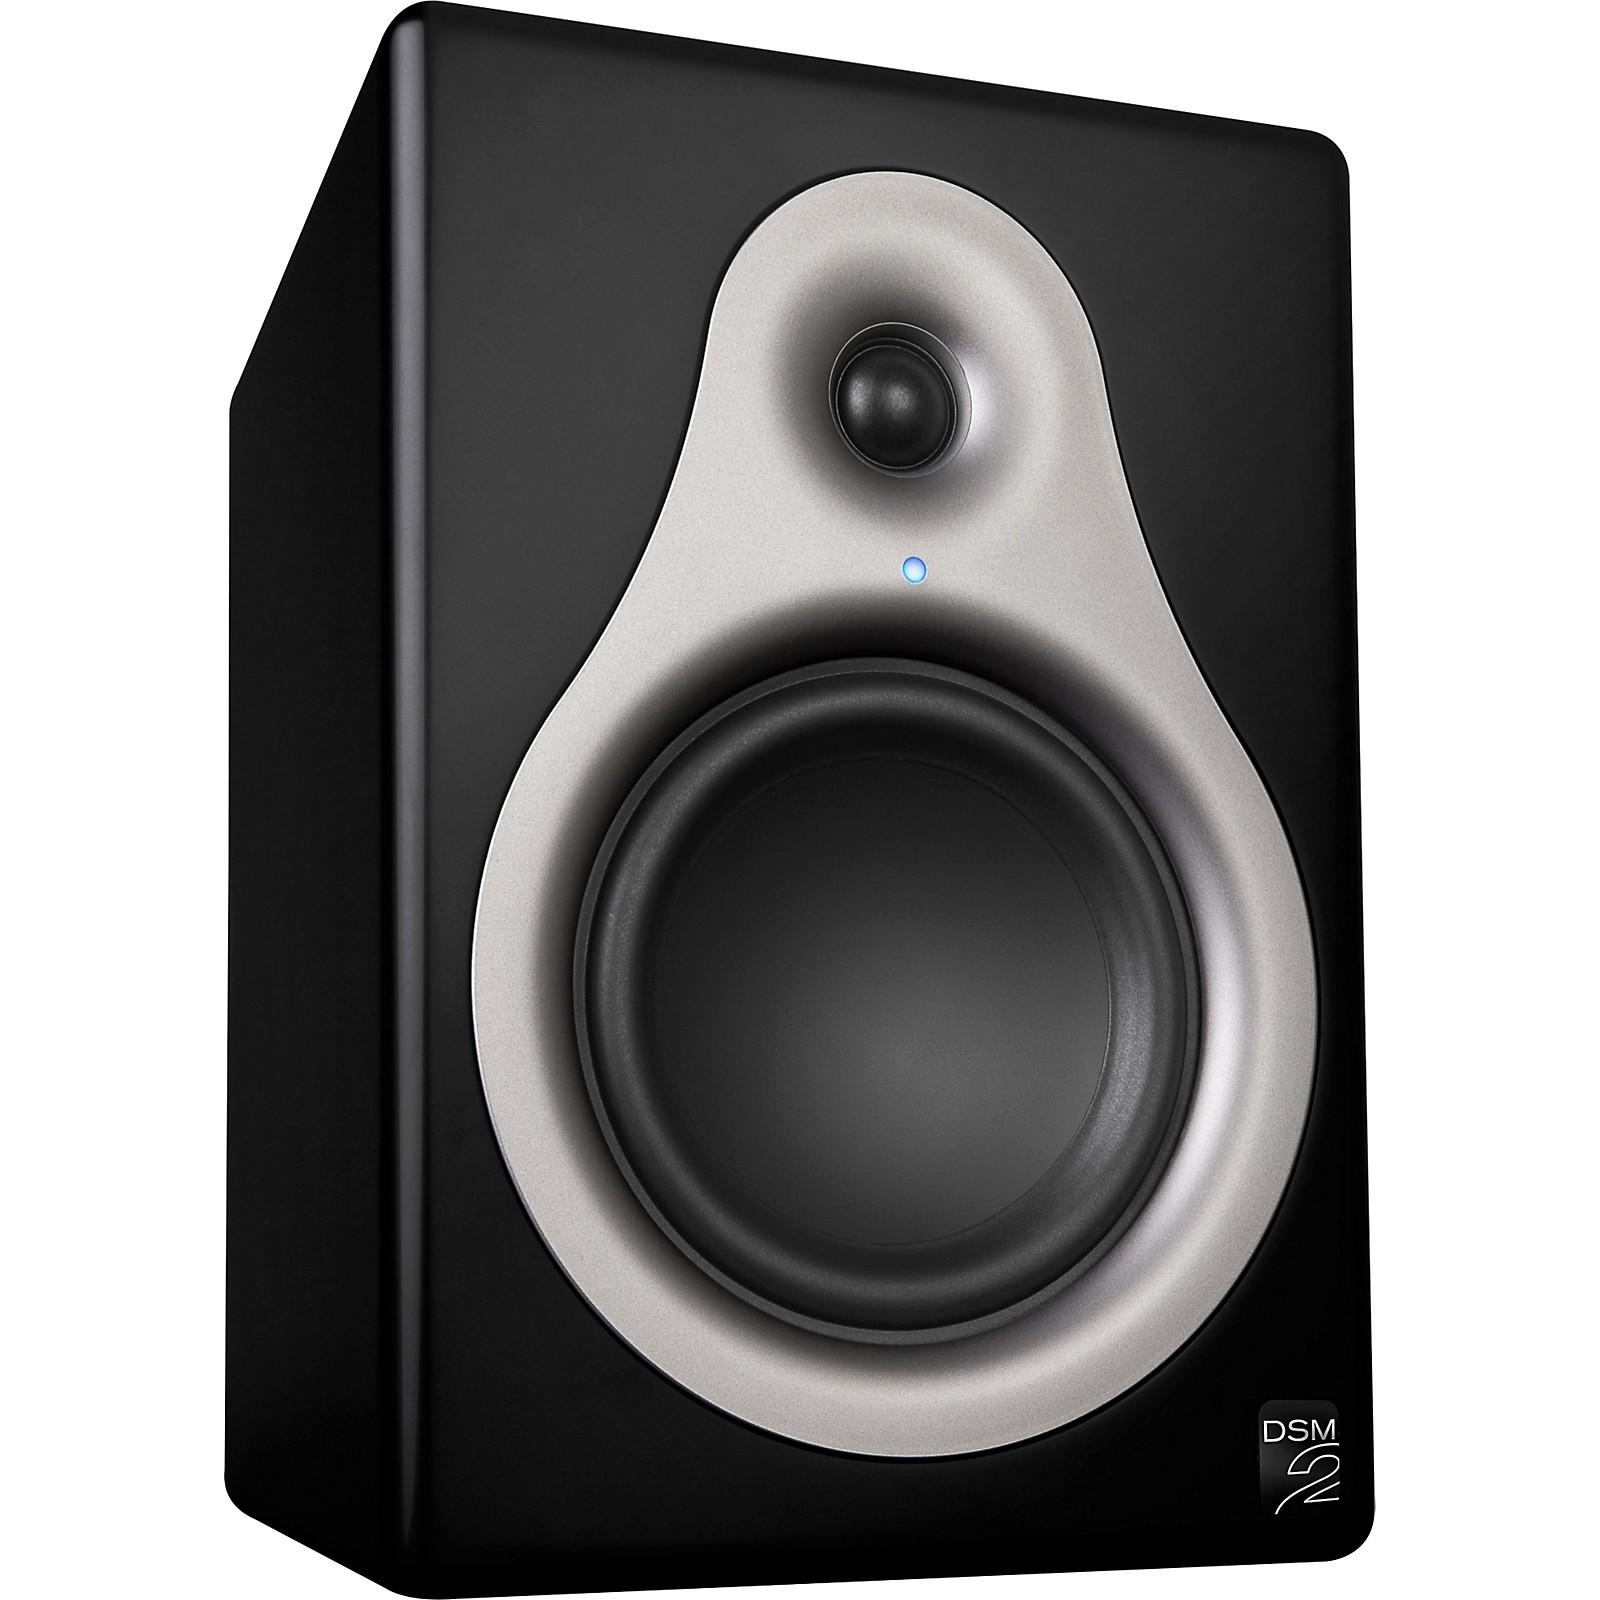 M-Audio Studiophile DSM2 Active Studio Monitor